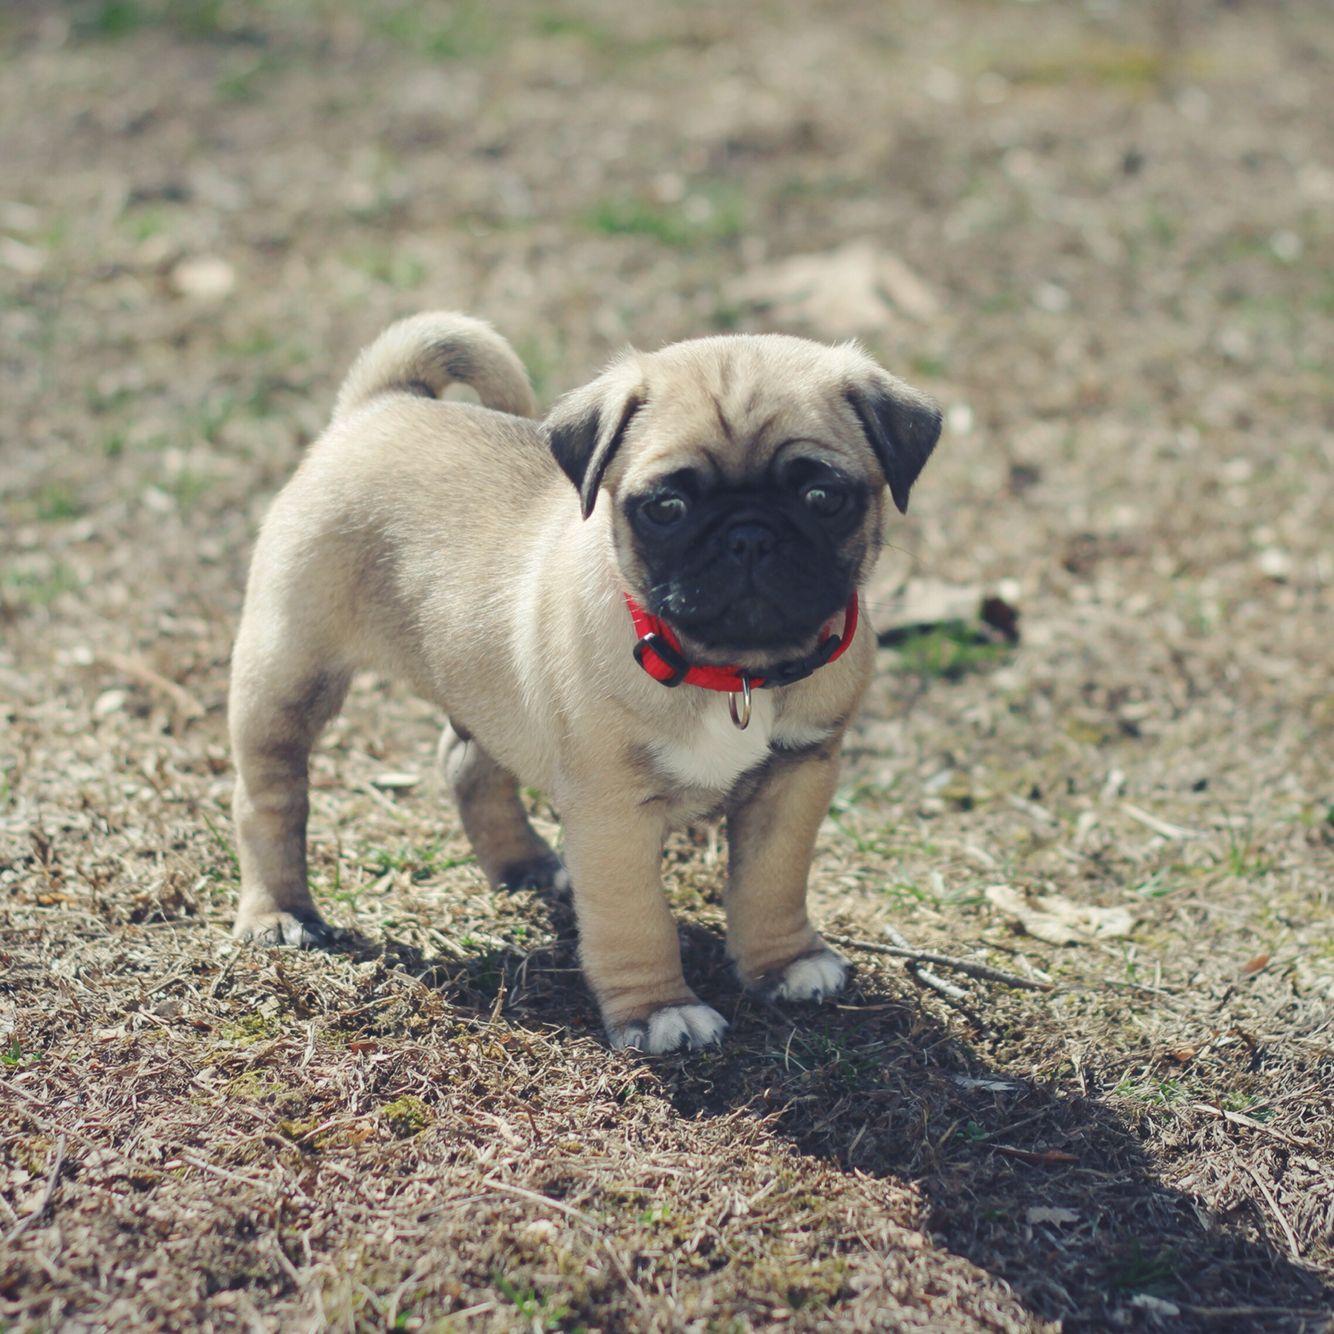 Boomer The Pug Cutest Pug On Instagram Cute Pugs Dogs Pets